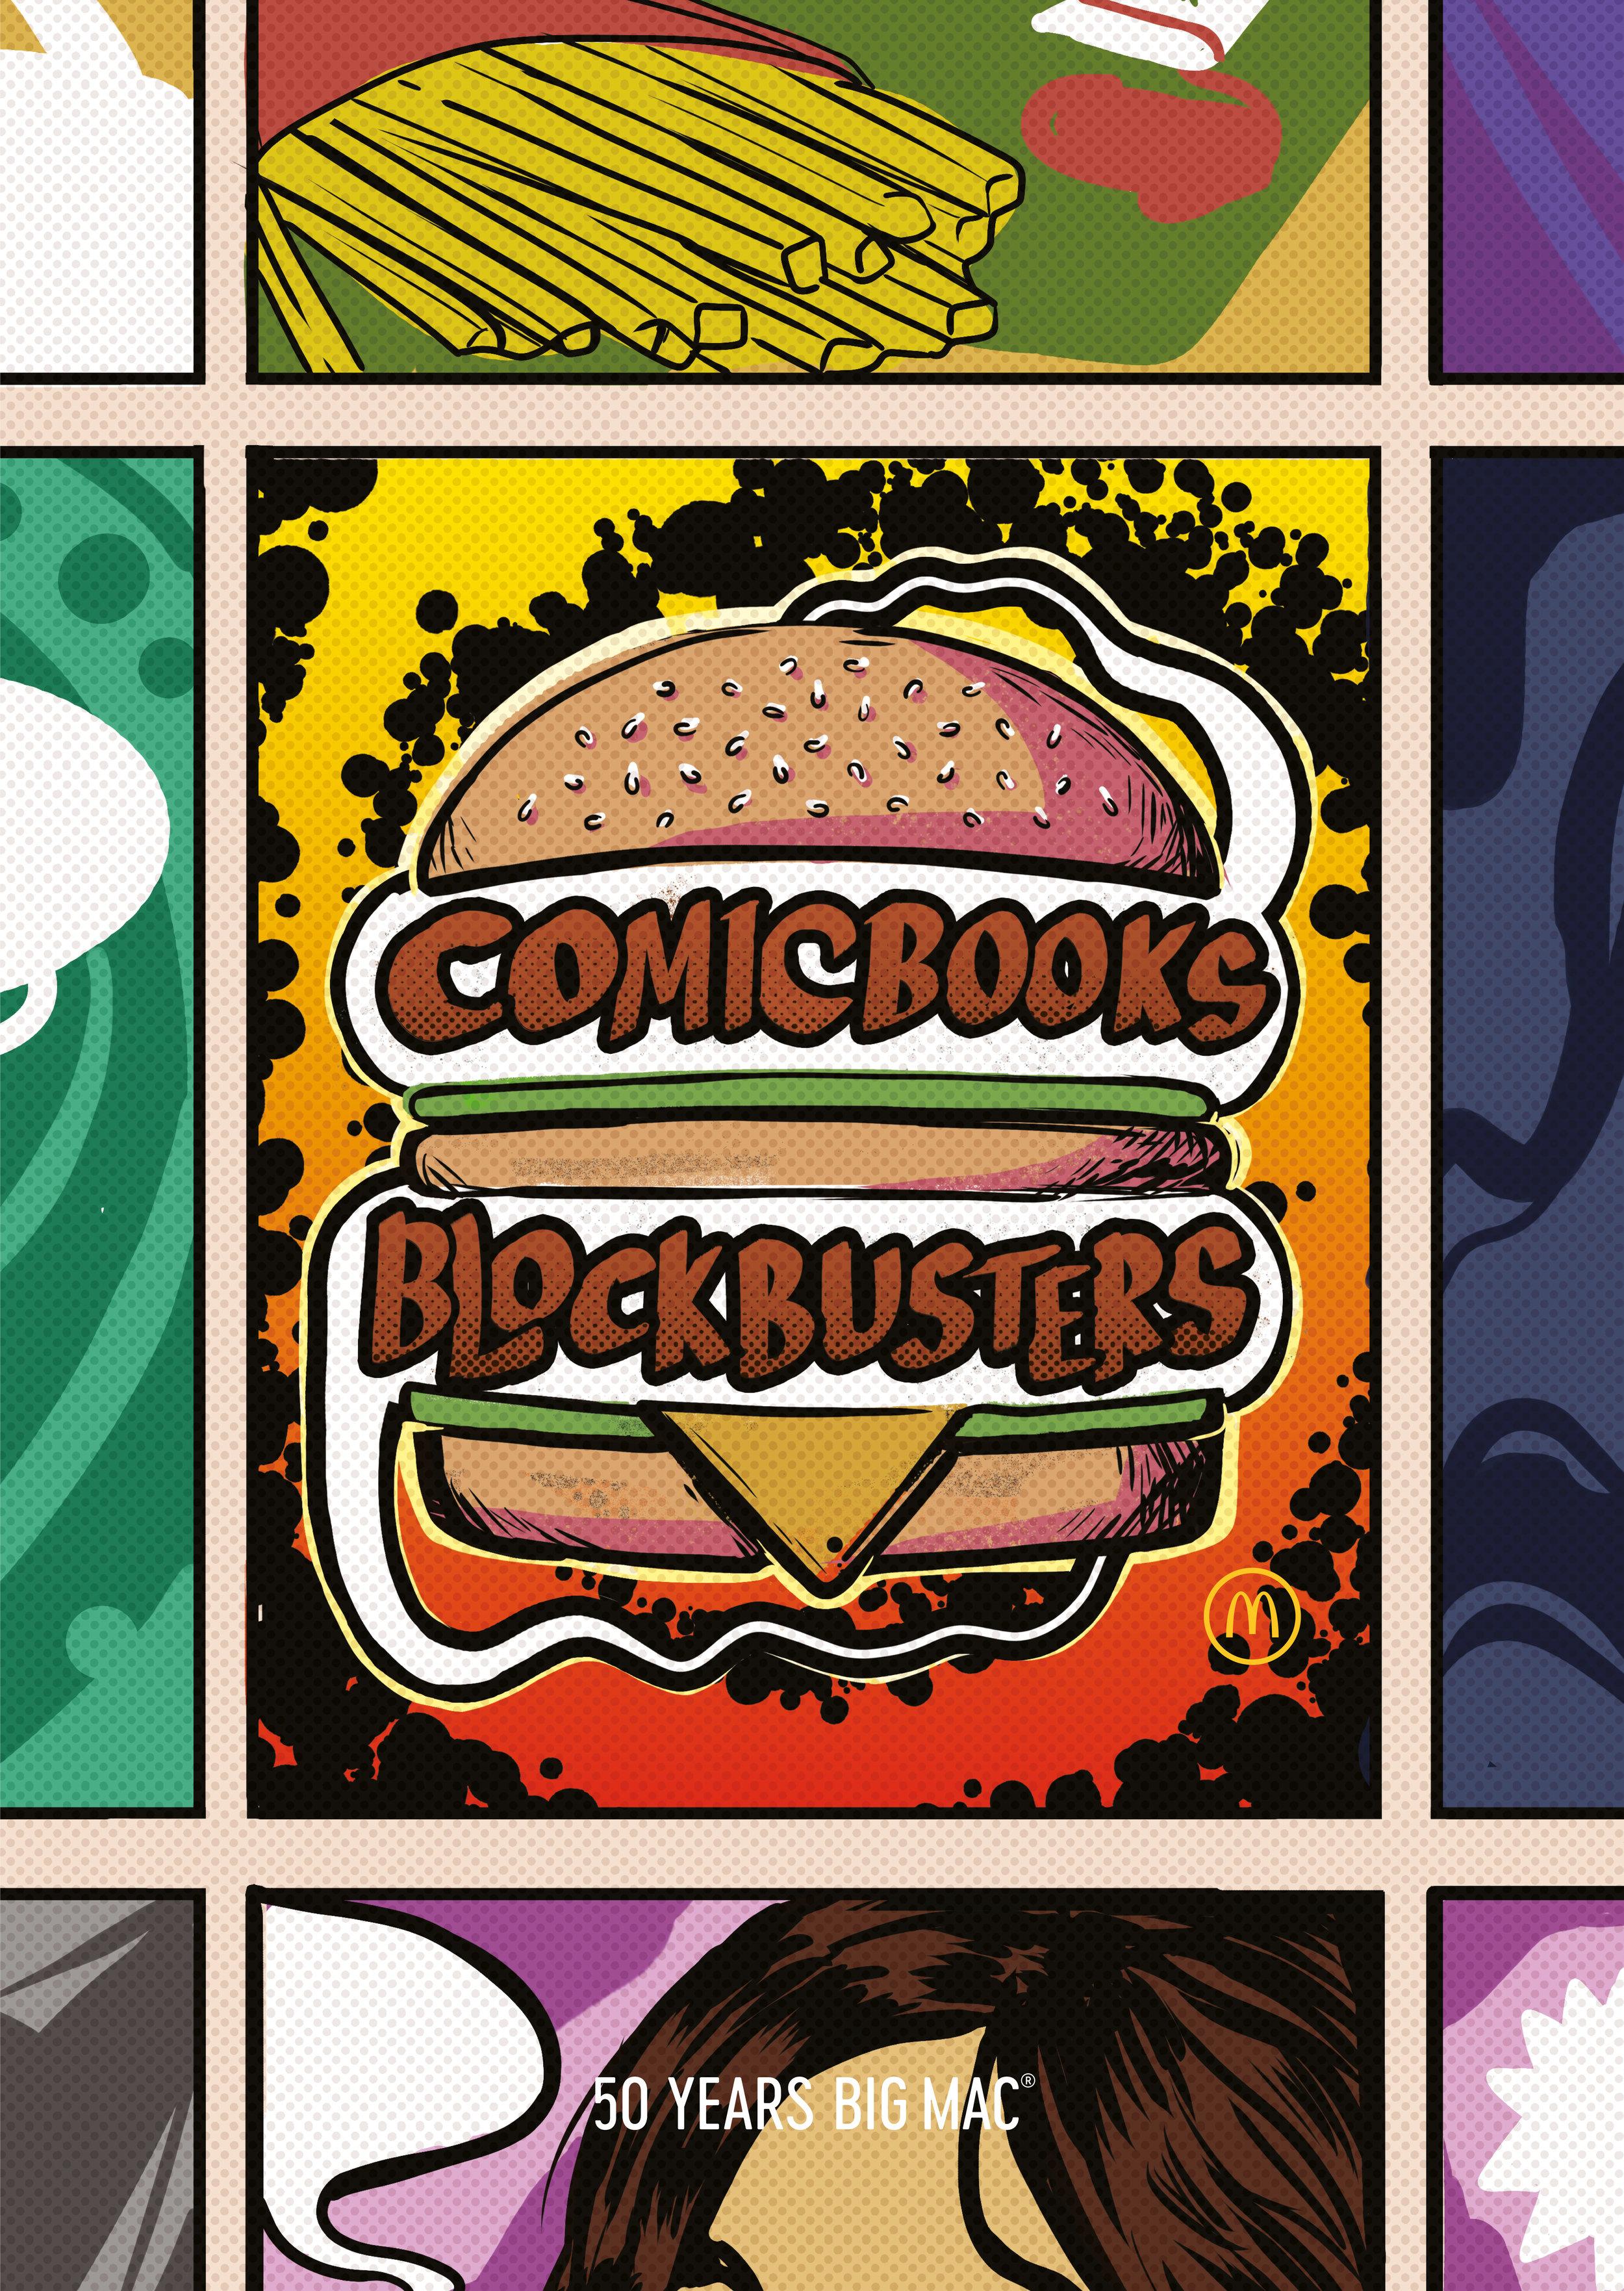 40_Comicbooks:Blockbusters.jpg